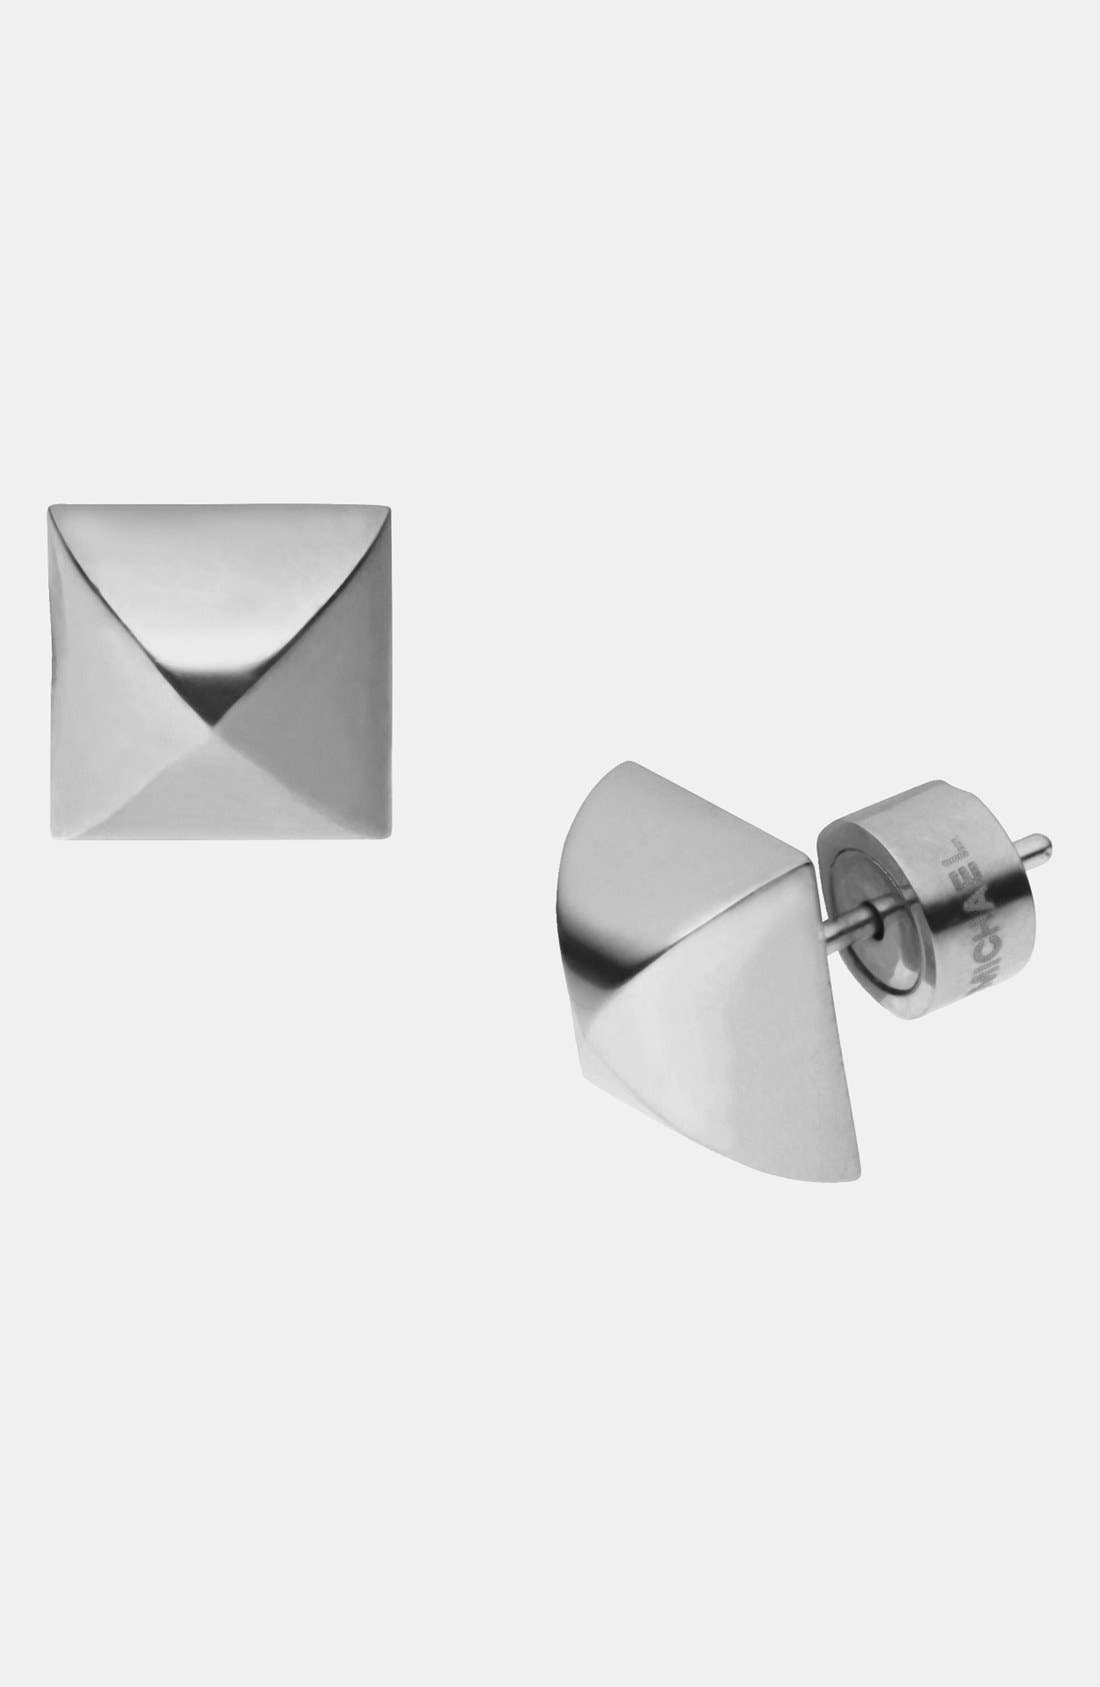 Main Image - Michael Kors 'Glam Rock' Pyramid Stud Earrings